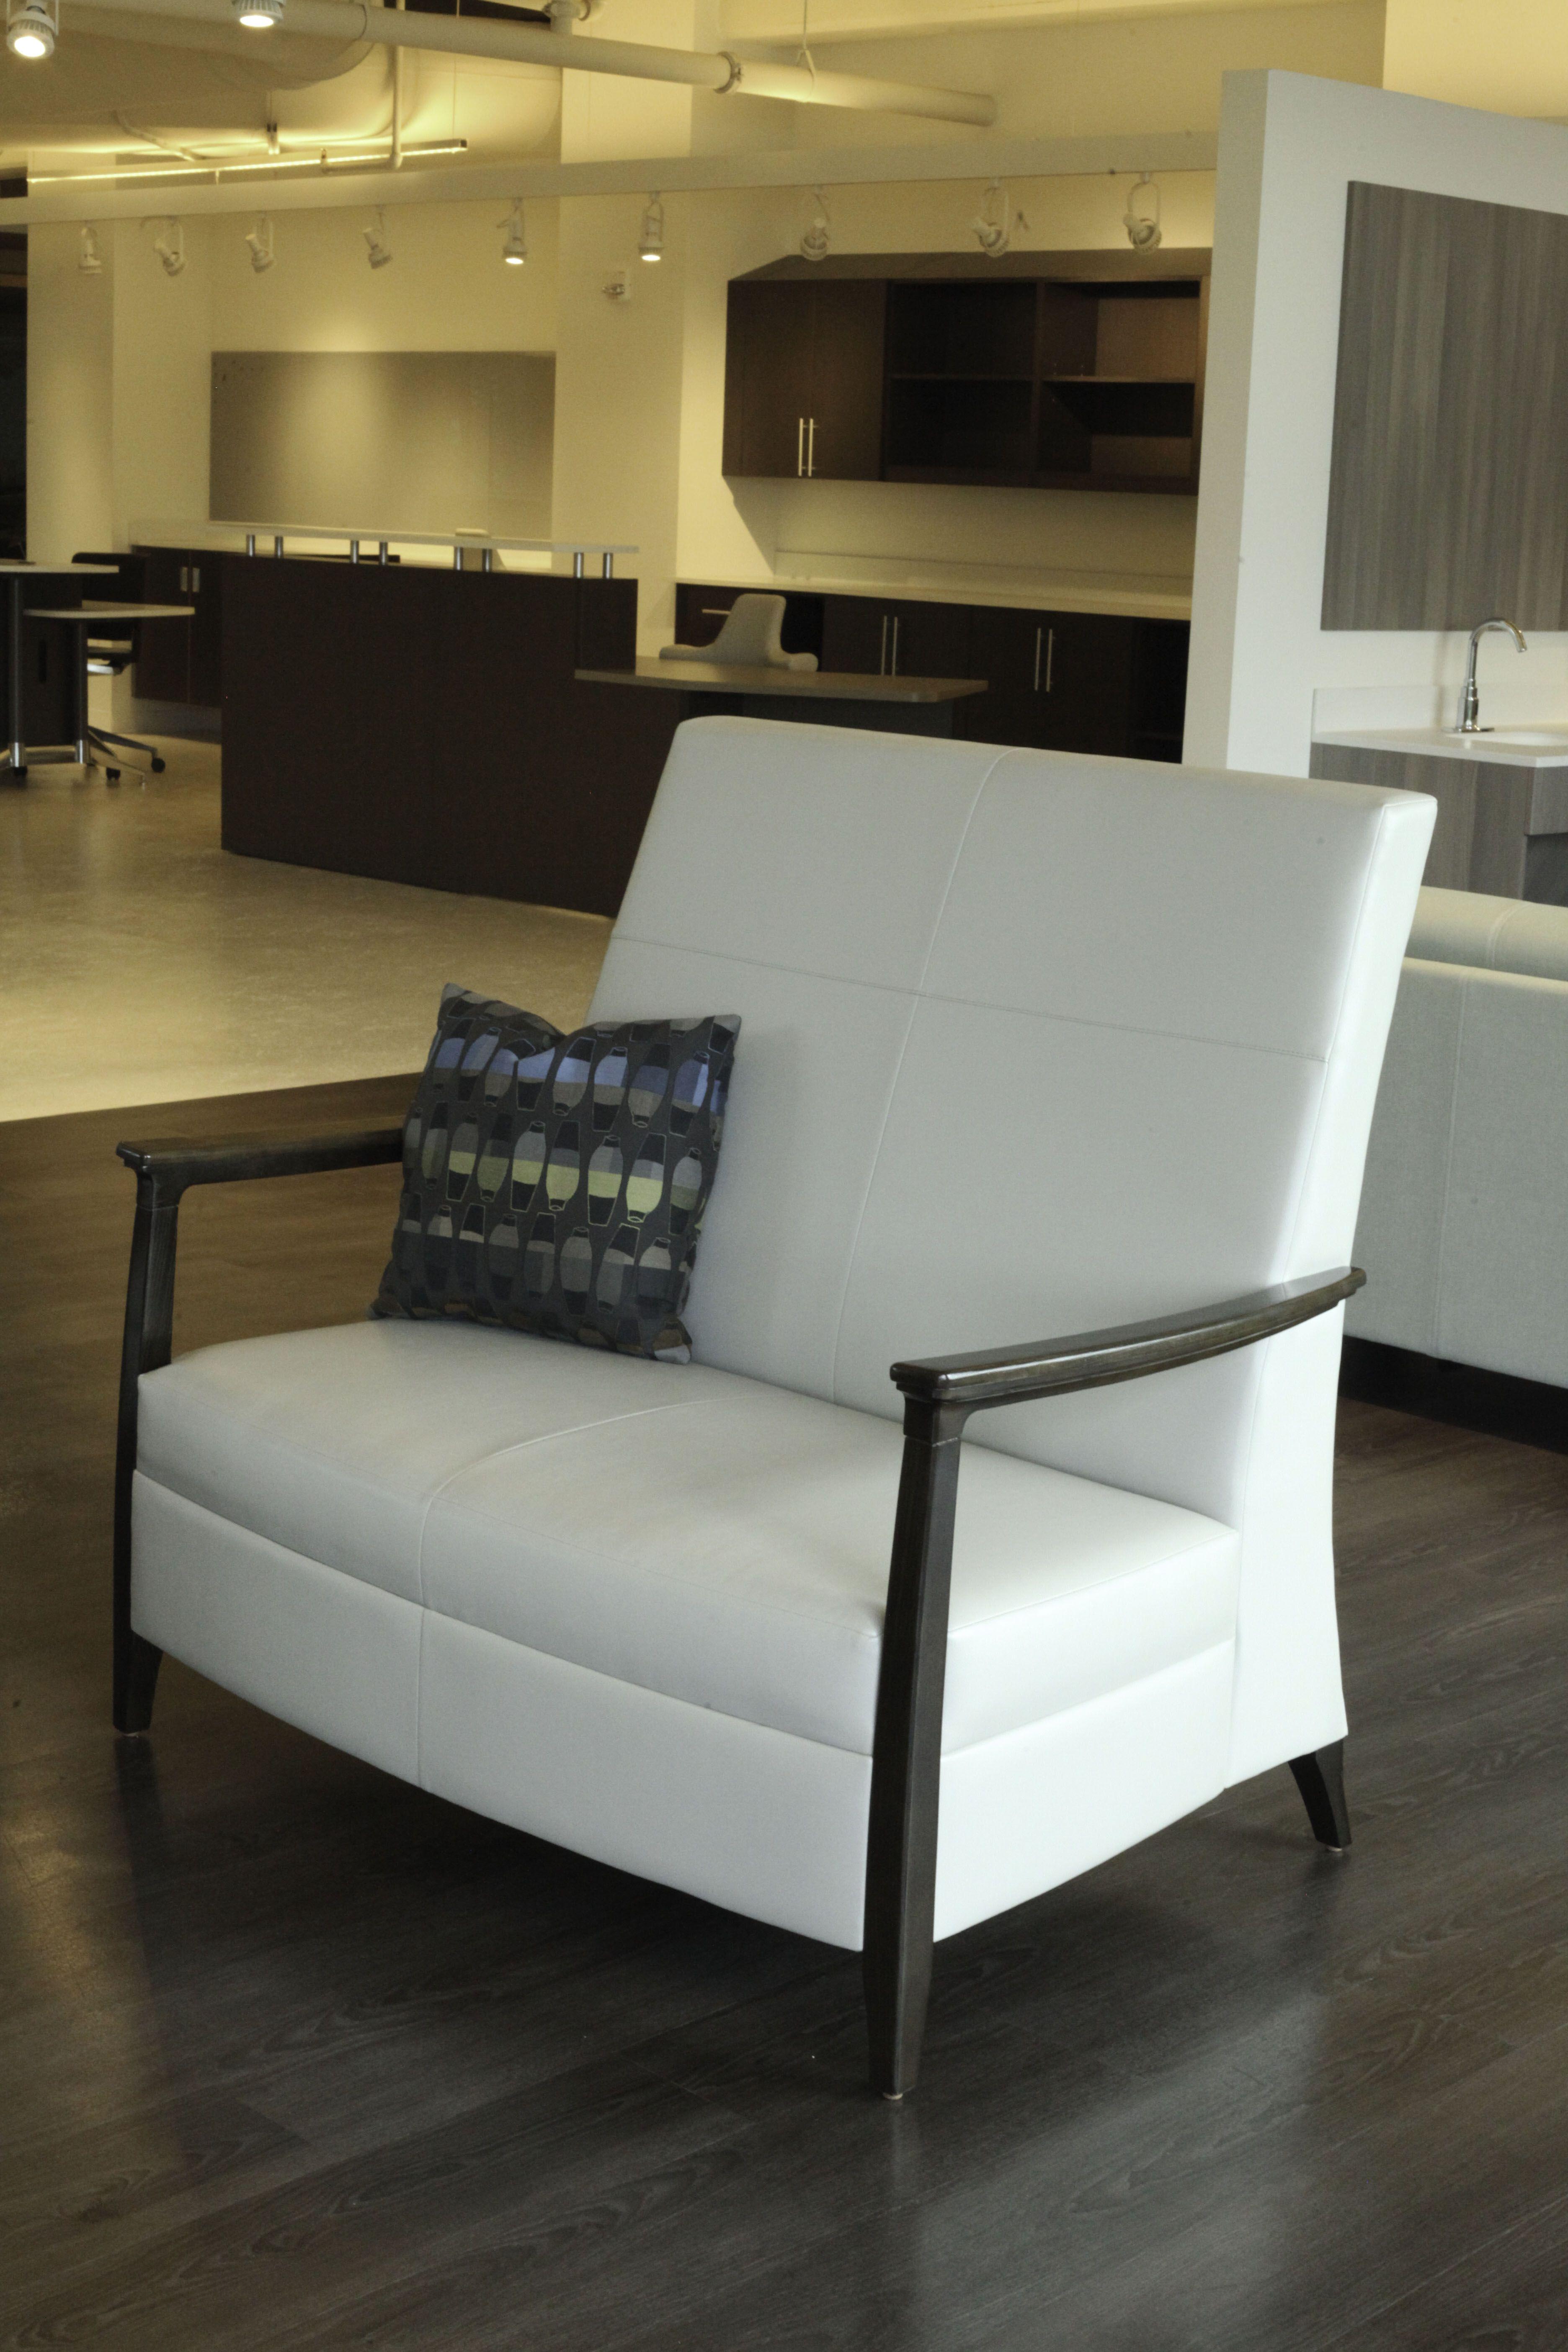 Modern Amenity Bariatric Chair | Manufacturer: Carolina Business Furniture  | Manufacturer Website: Http: